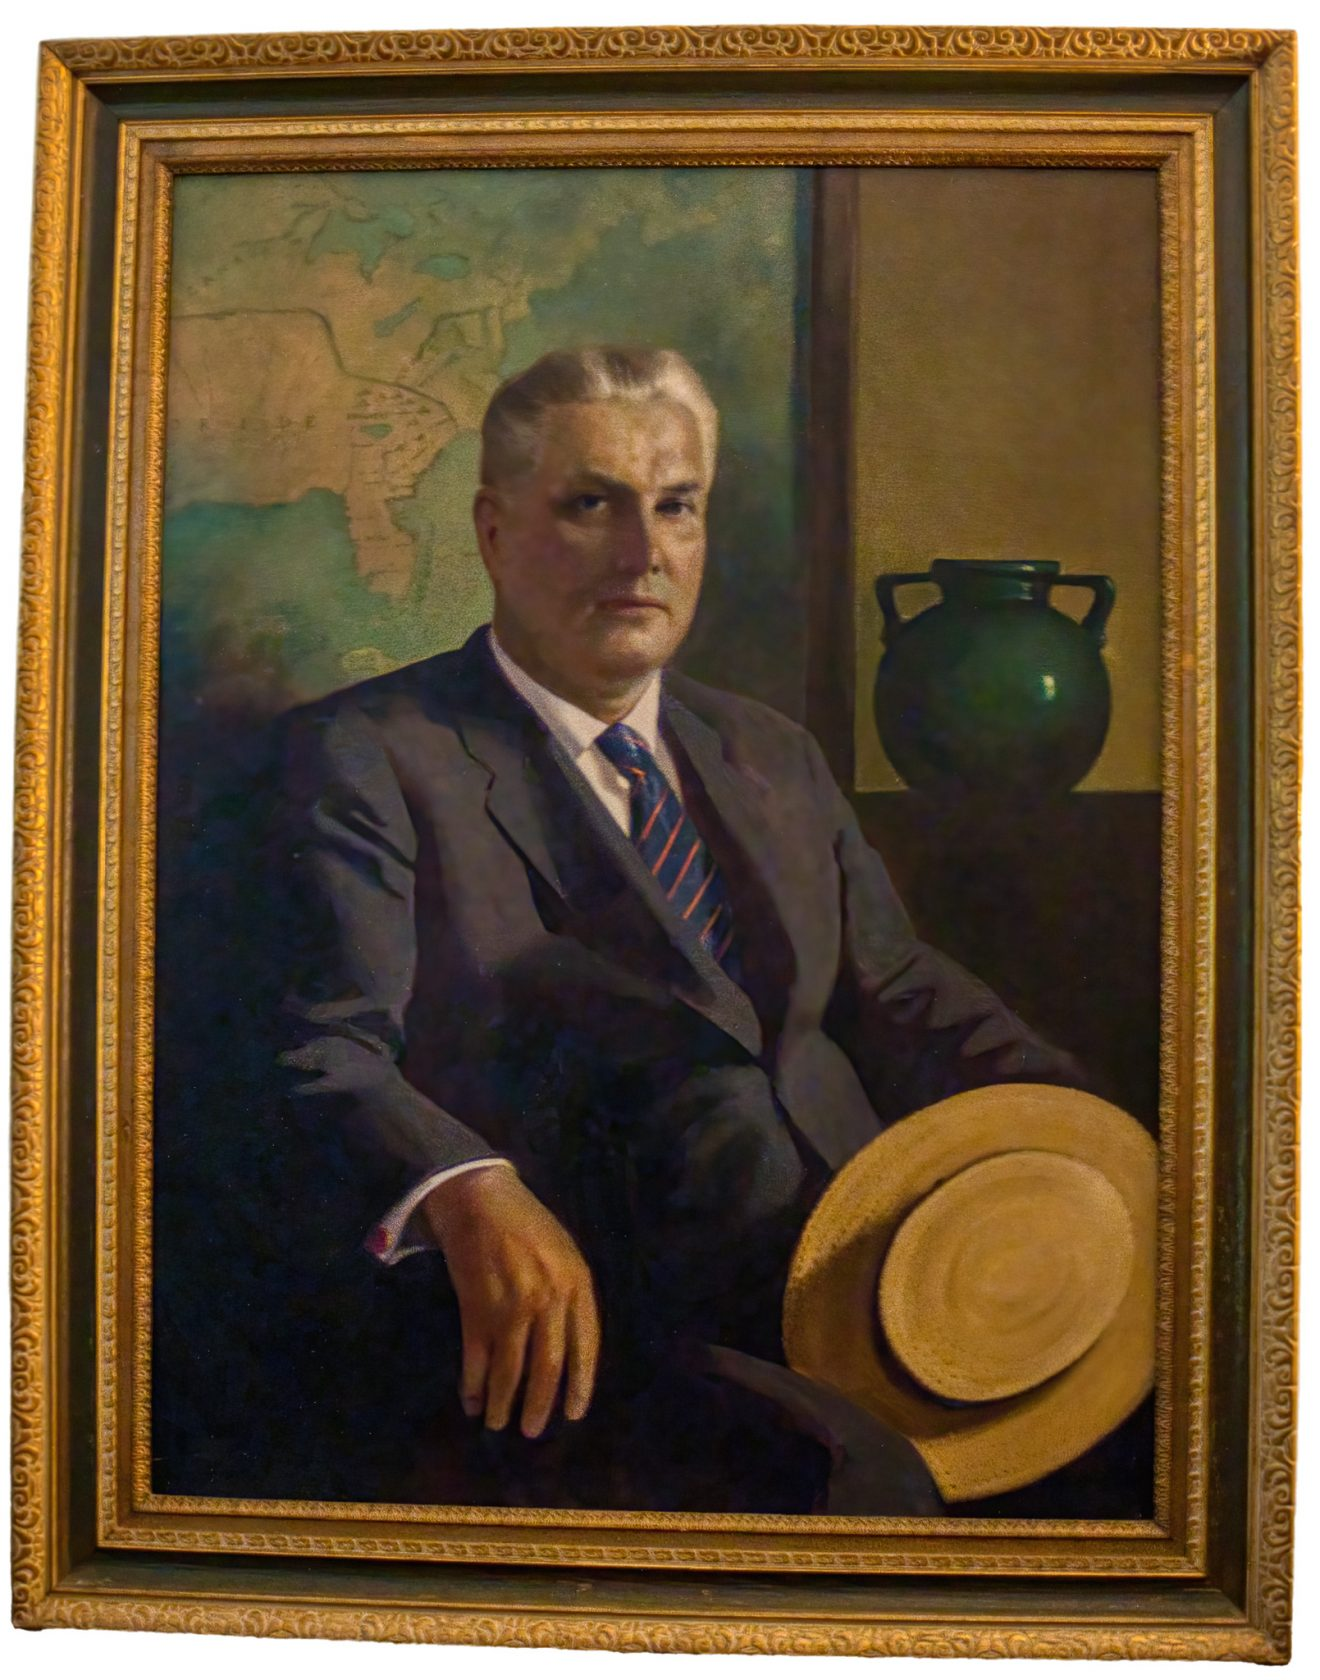 Merrick Portrait